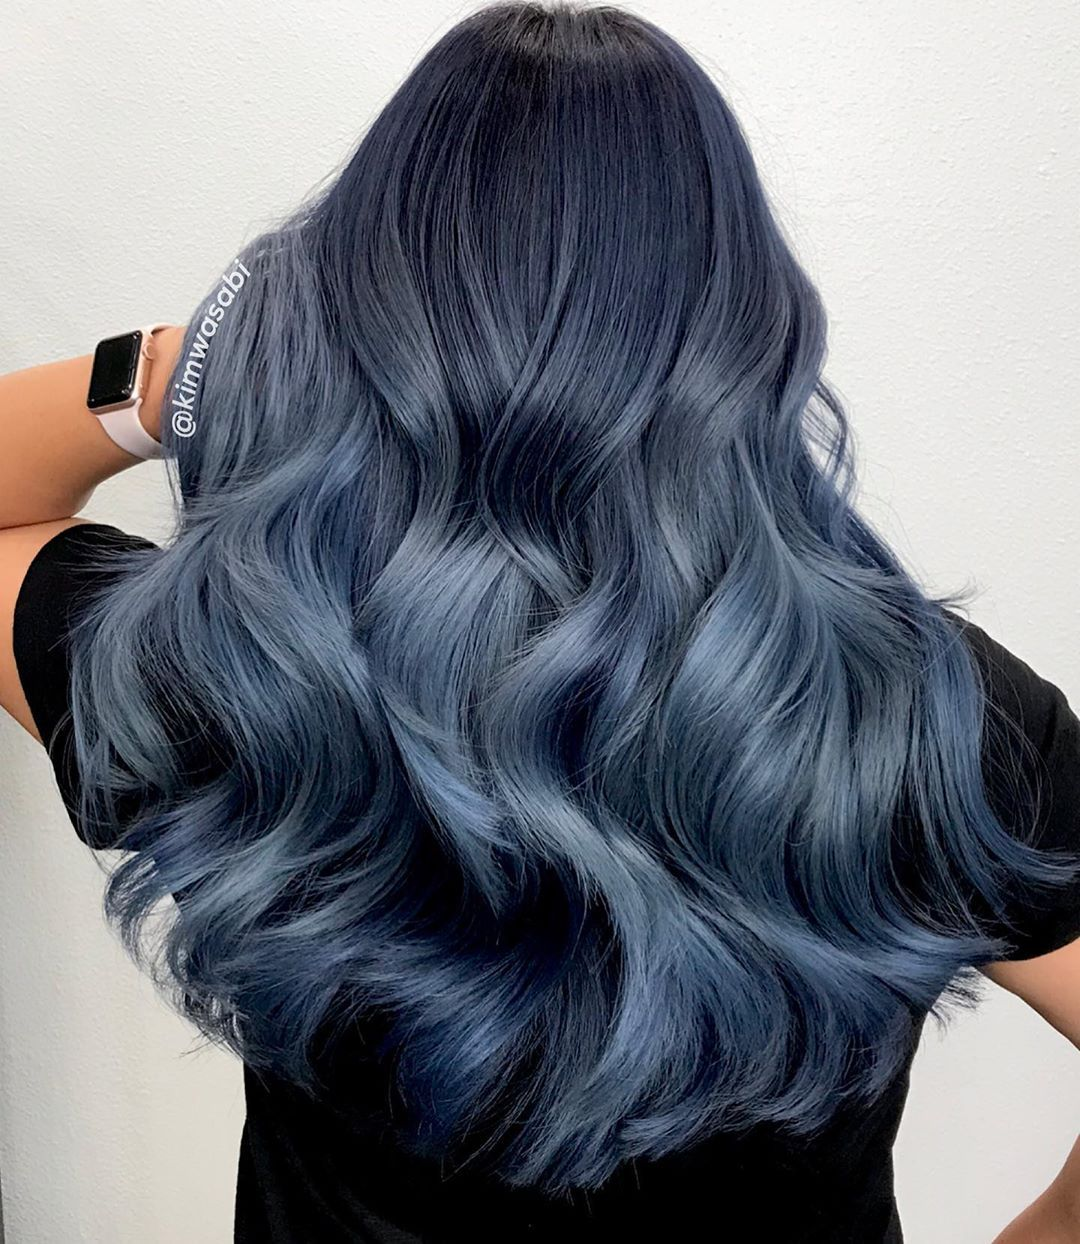 Kim Wasabi Color Using Guytang Mydentity In 2020 Light Blue Hair Light Blue Ombre Hair Blue Ombre Hair